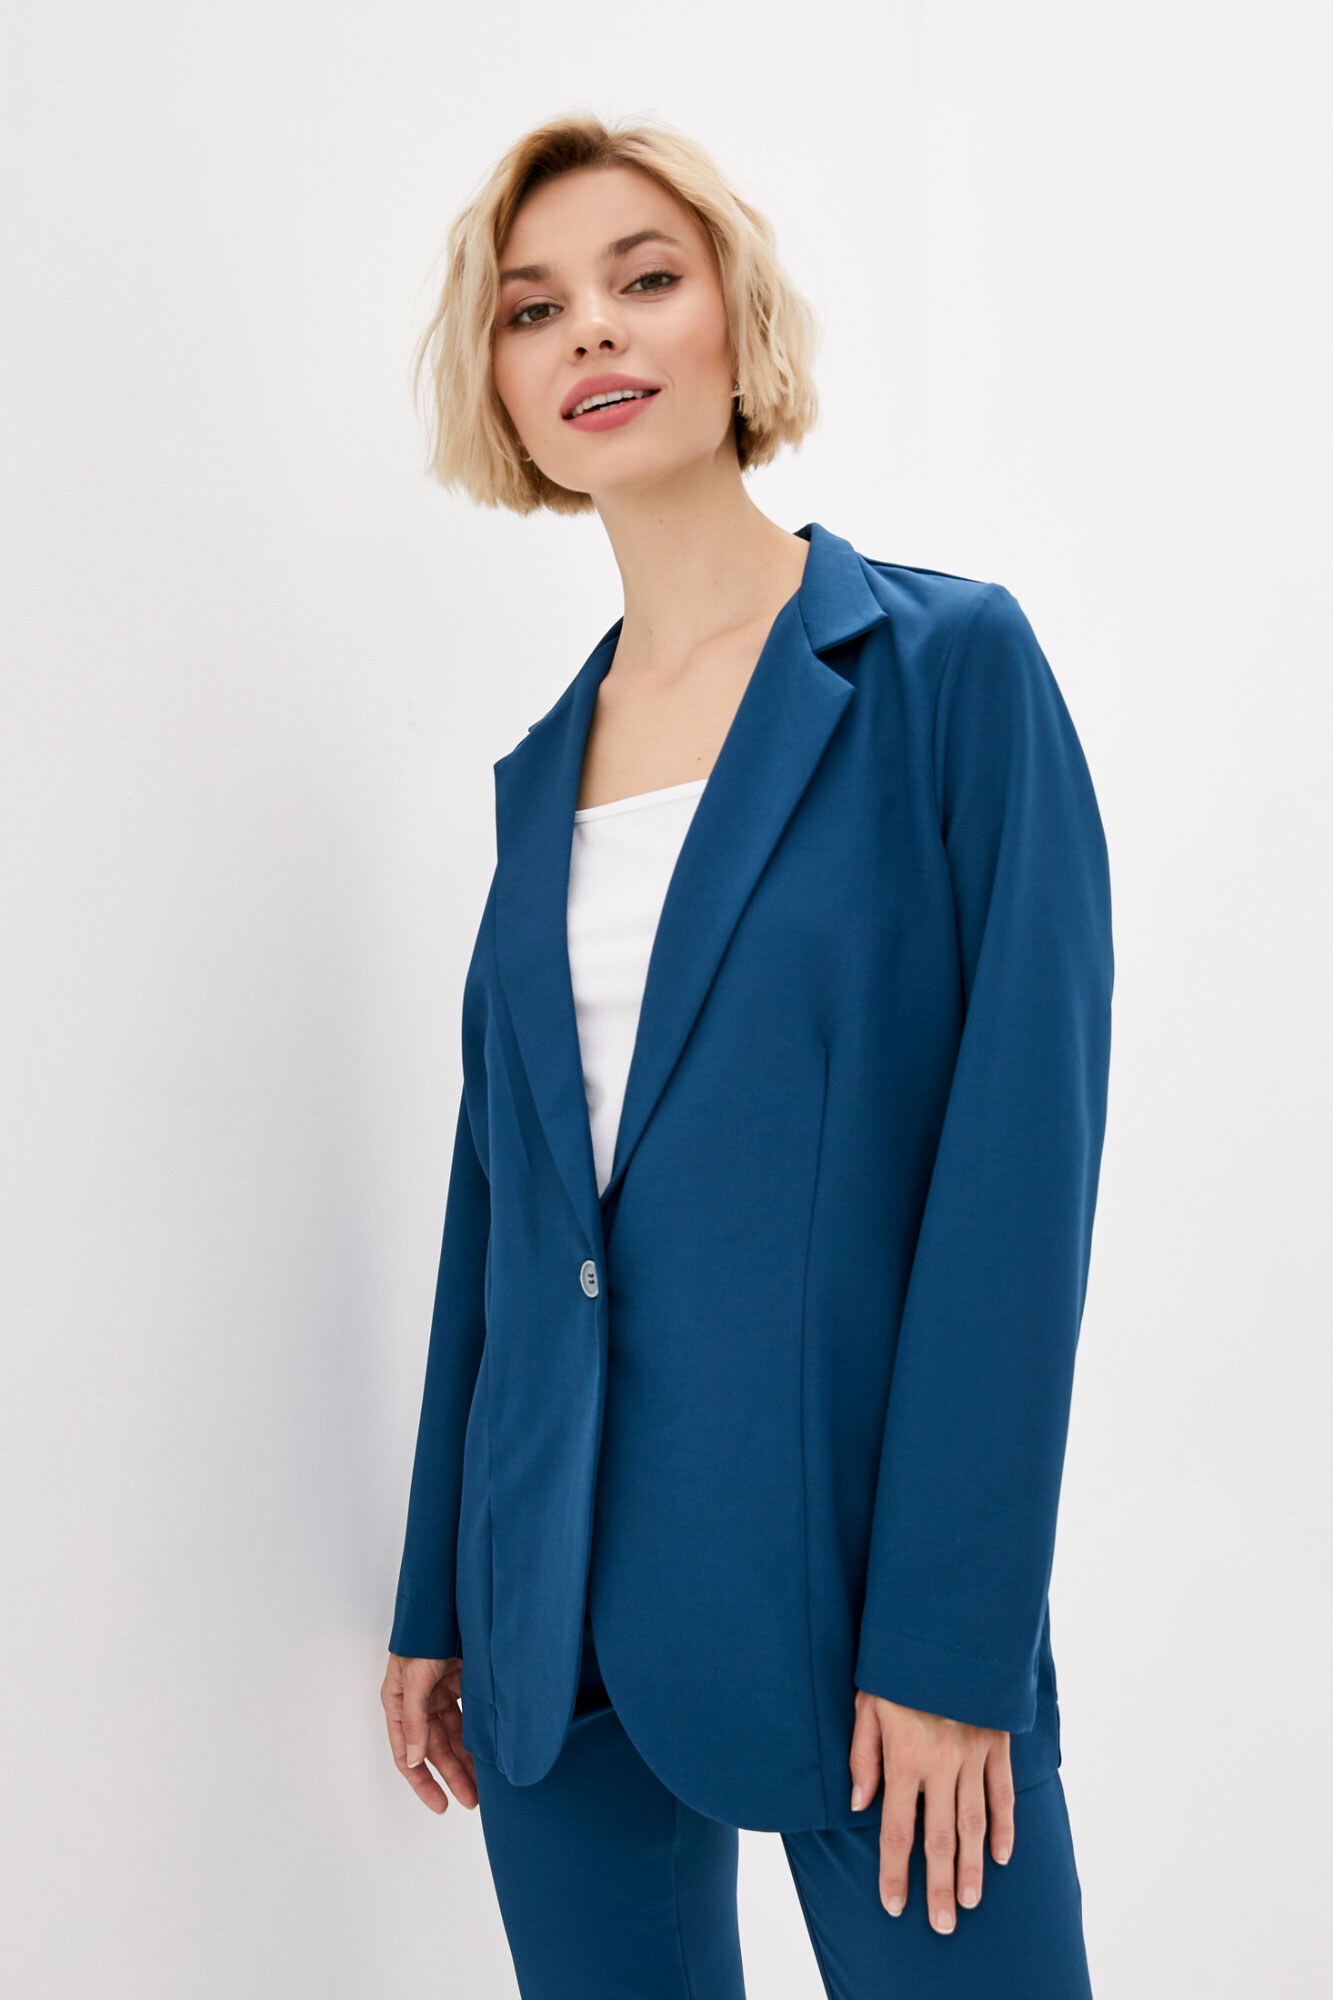 Оверсайз пиджак бирюзового цвета в кэжуал стиле